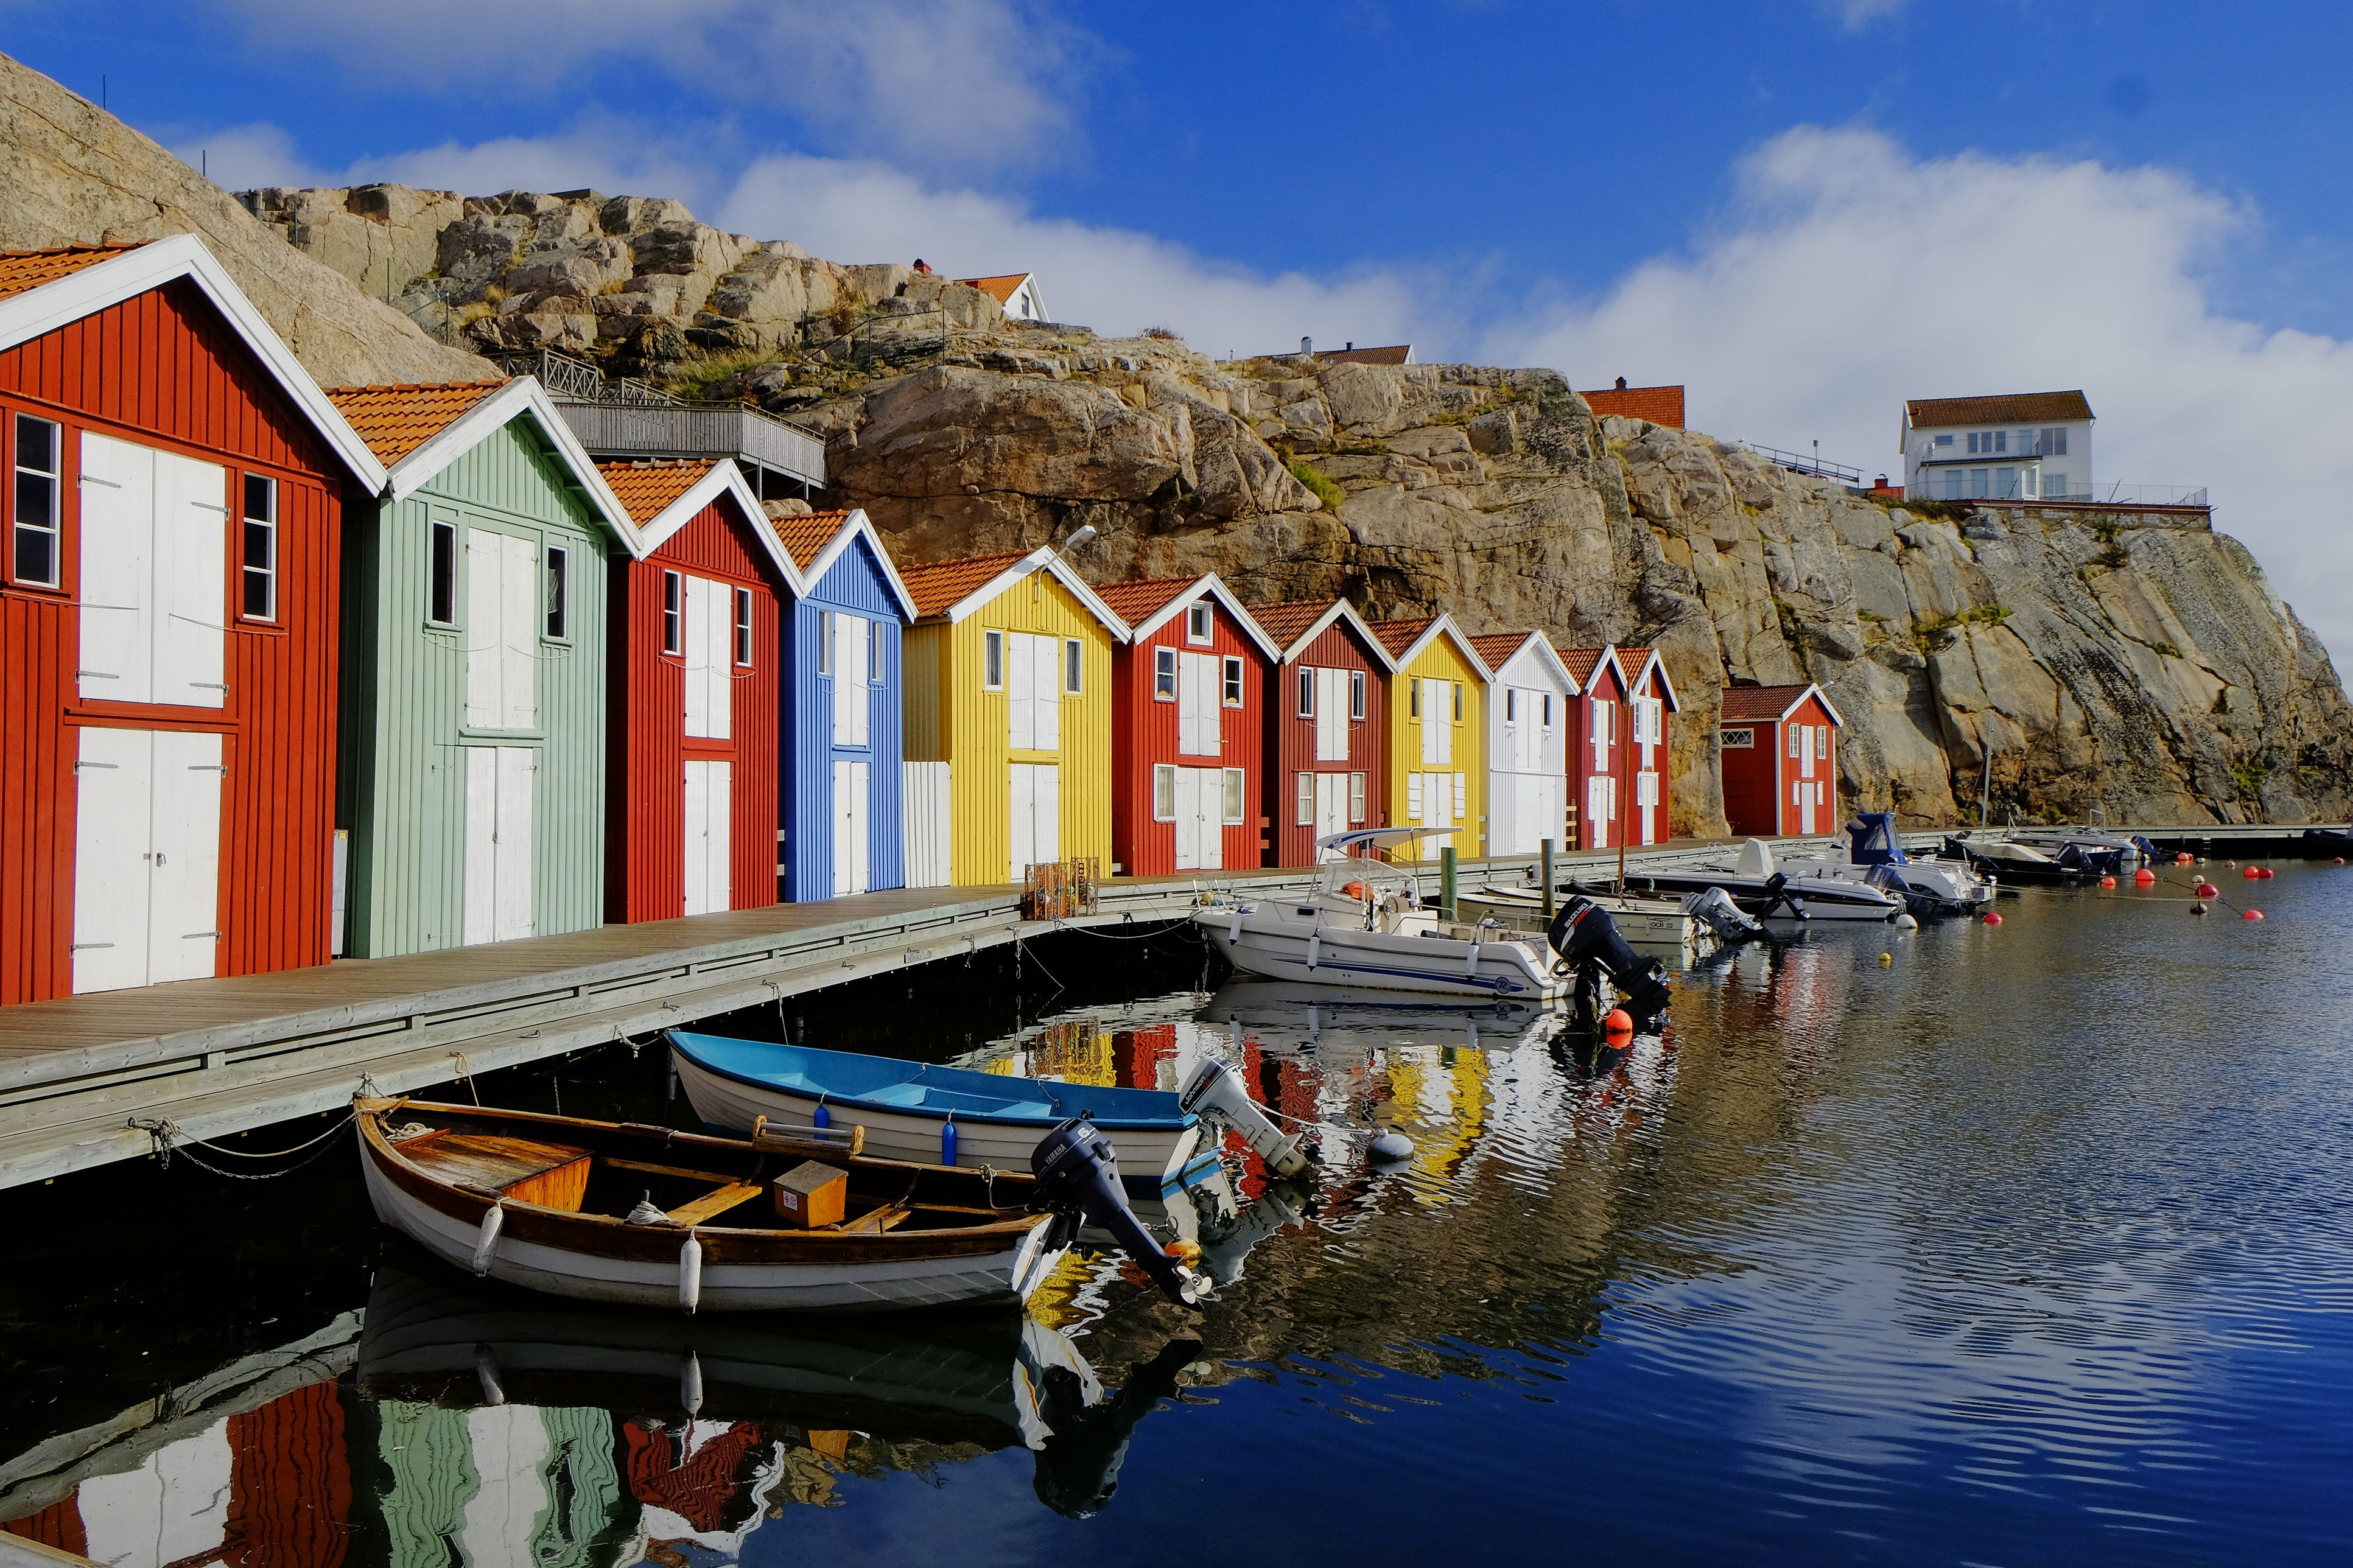 Colorful fishing huts